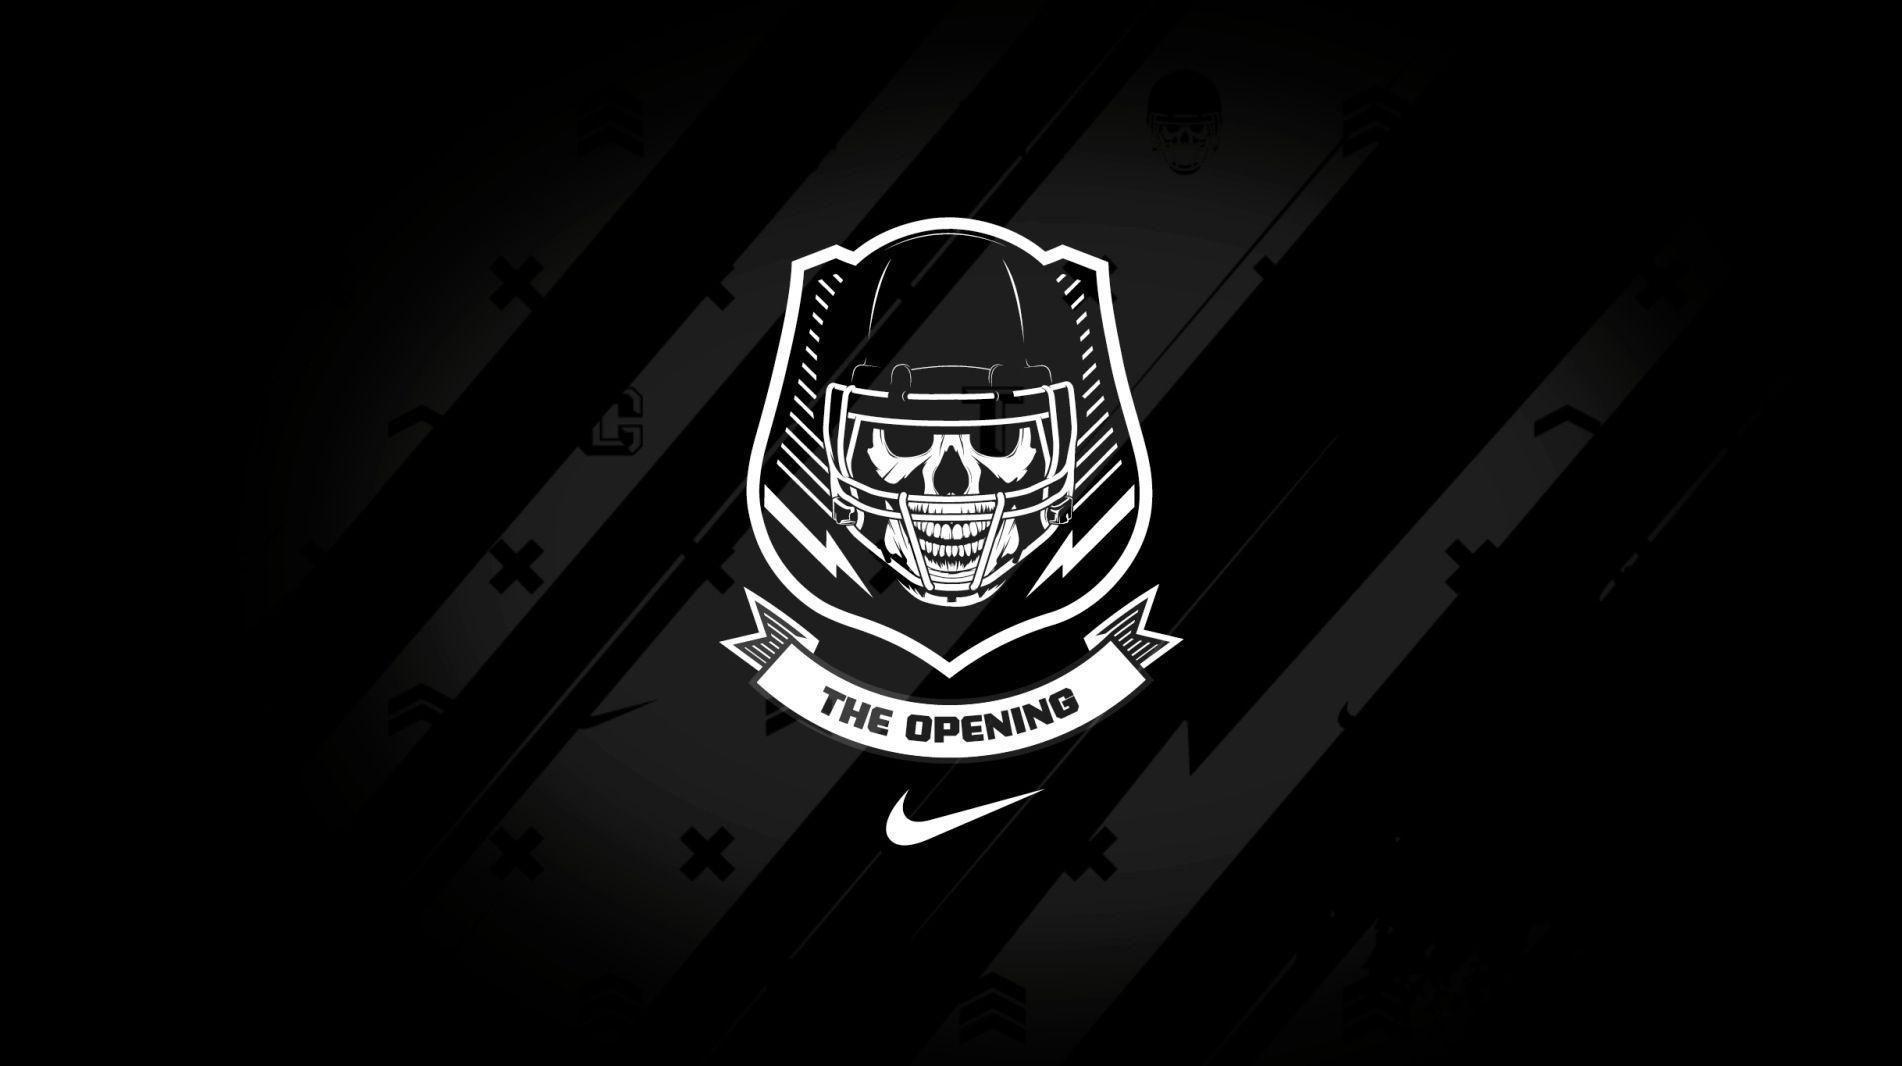 American Football Wallpaper Iphone In 2020 Football Wallpaper Football Wallpaper Iphone American Football